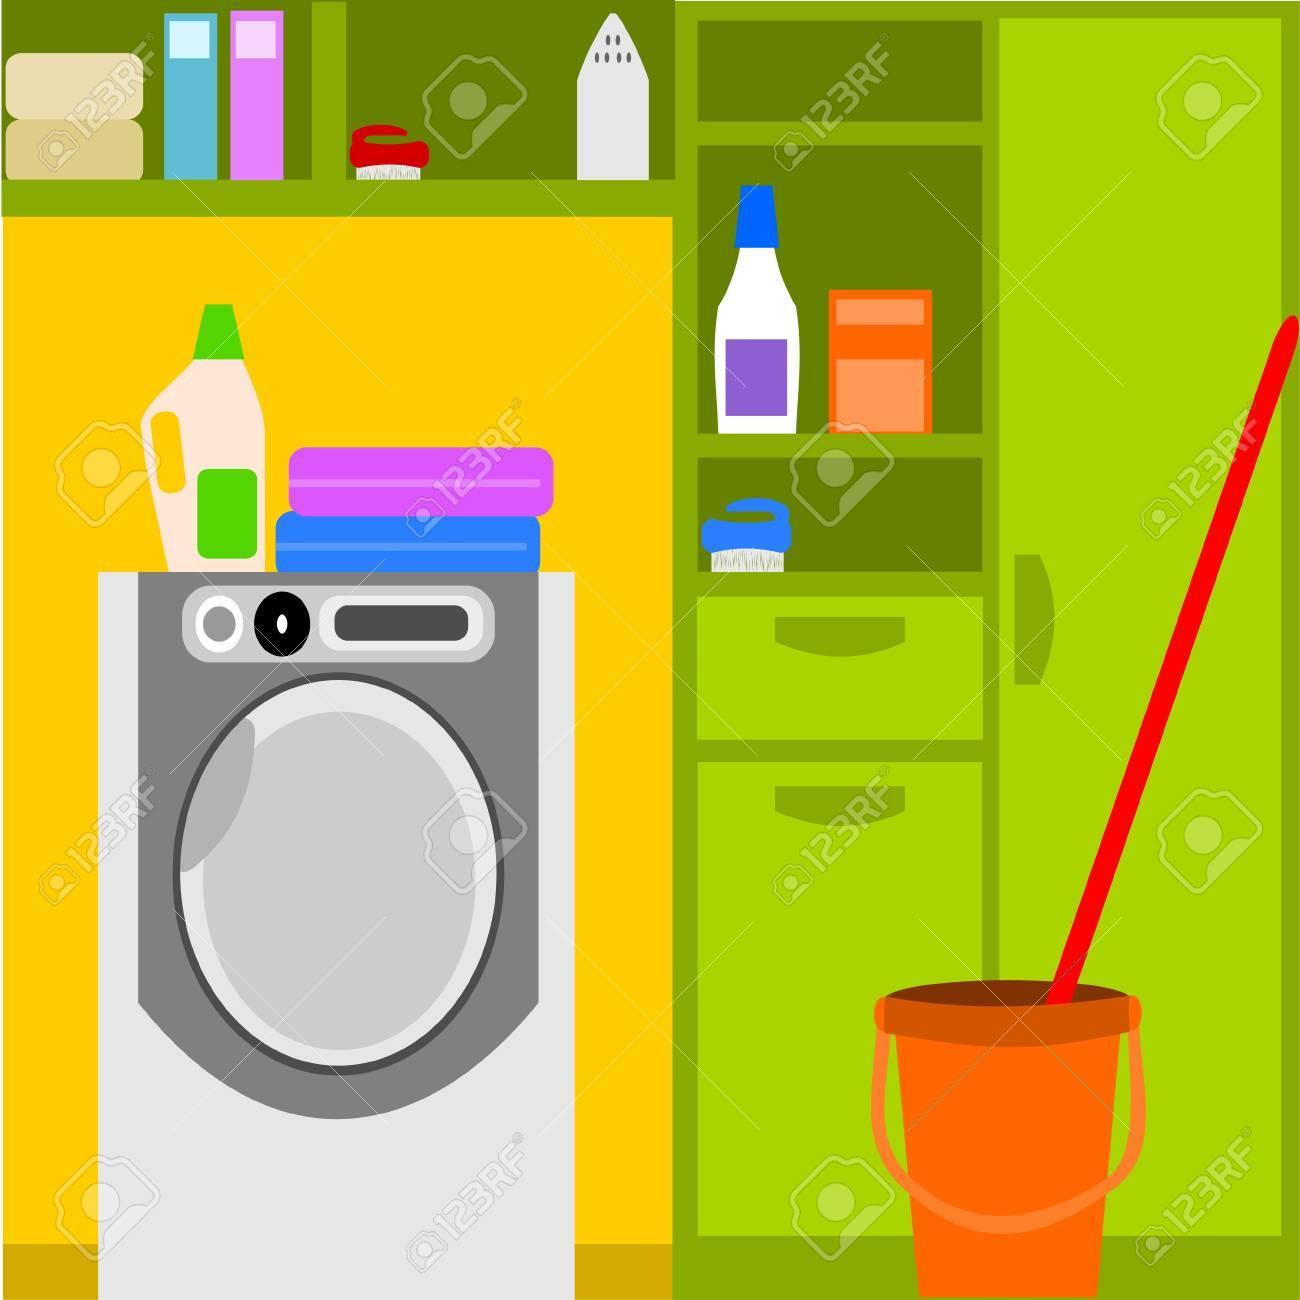 Laundry Stock Vector - 11032054